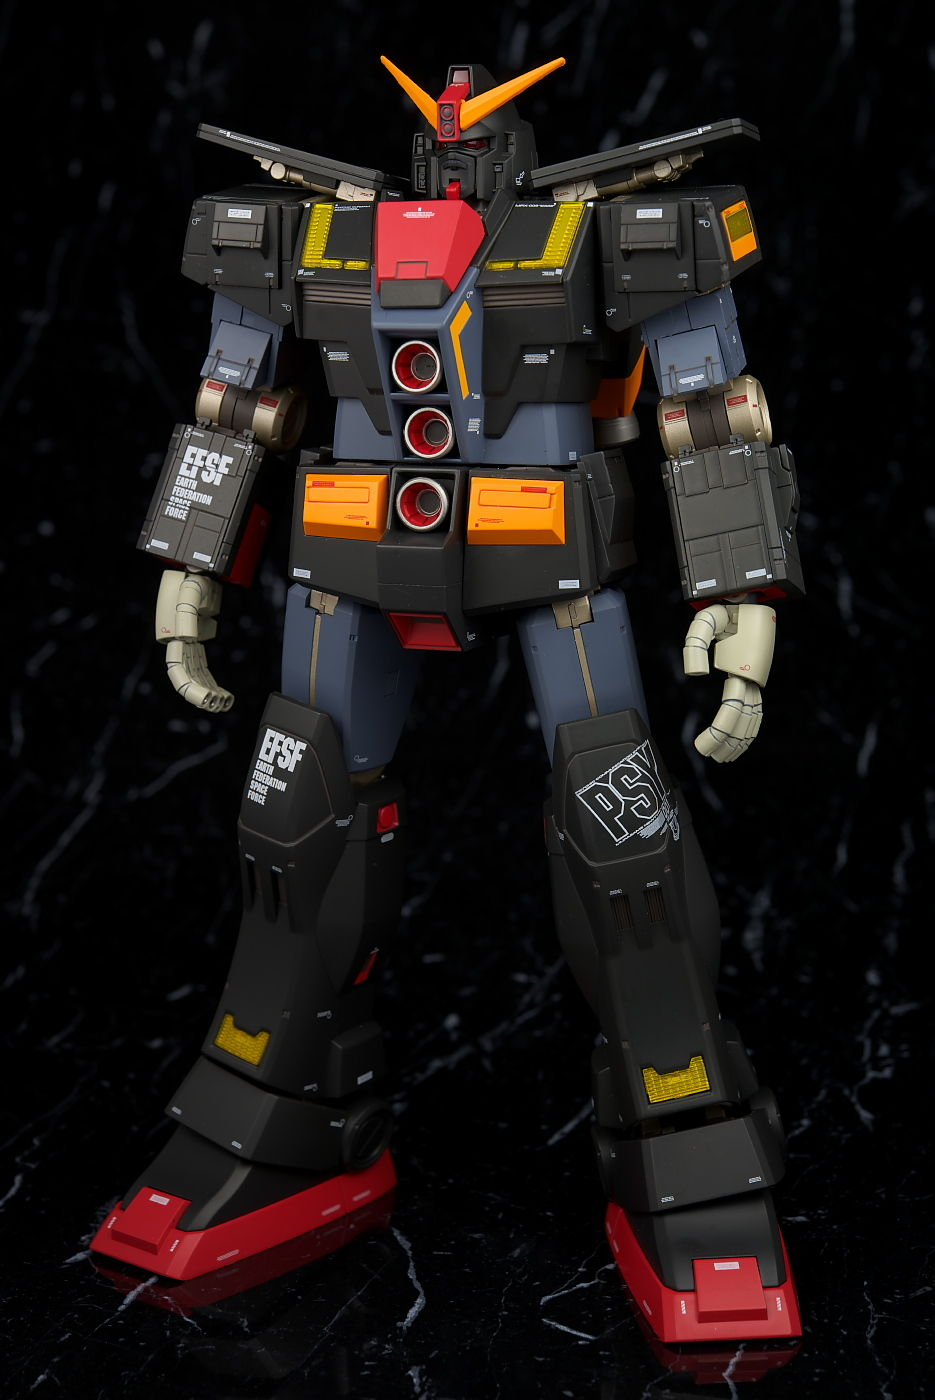 Gff 1002 Metal Composite Mrx 009 Psycho Gundam Full